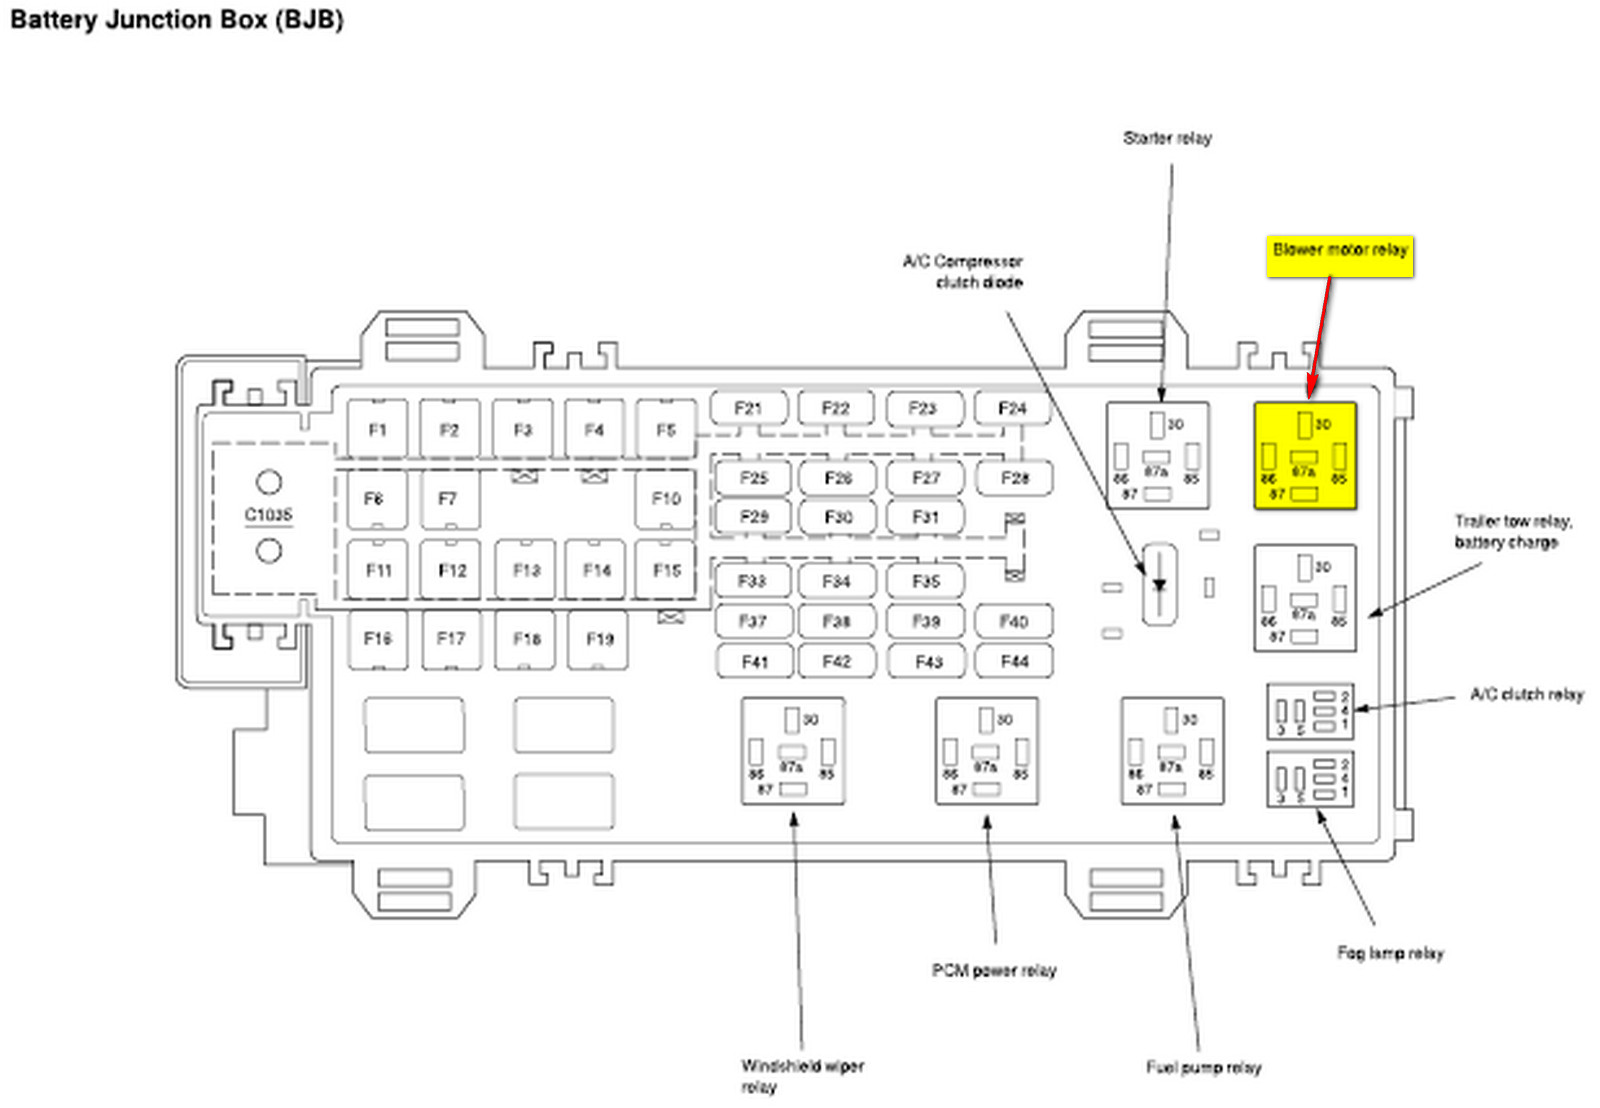 Marvelous 2000 Ford F750 Wiring Diagram Wiring Diagram Wiring Cloud Ittabpendurdonanfuldomelitekicepsianuembamohammedshrineorg